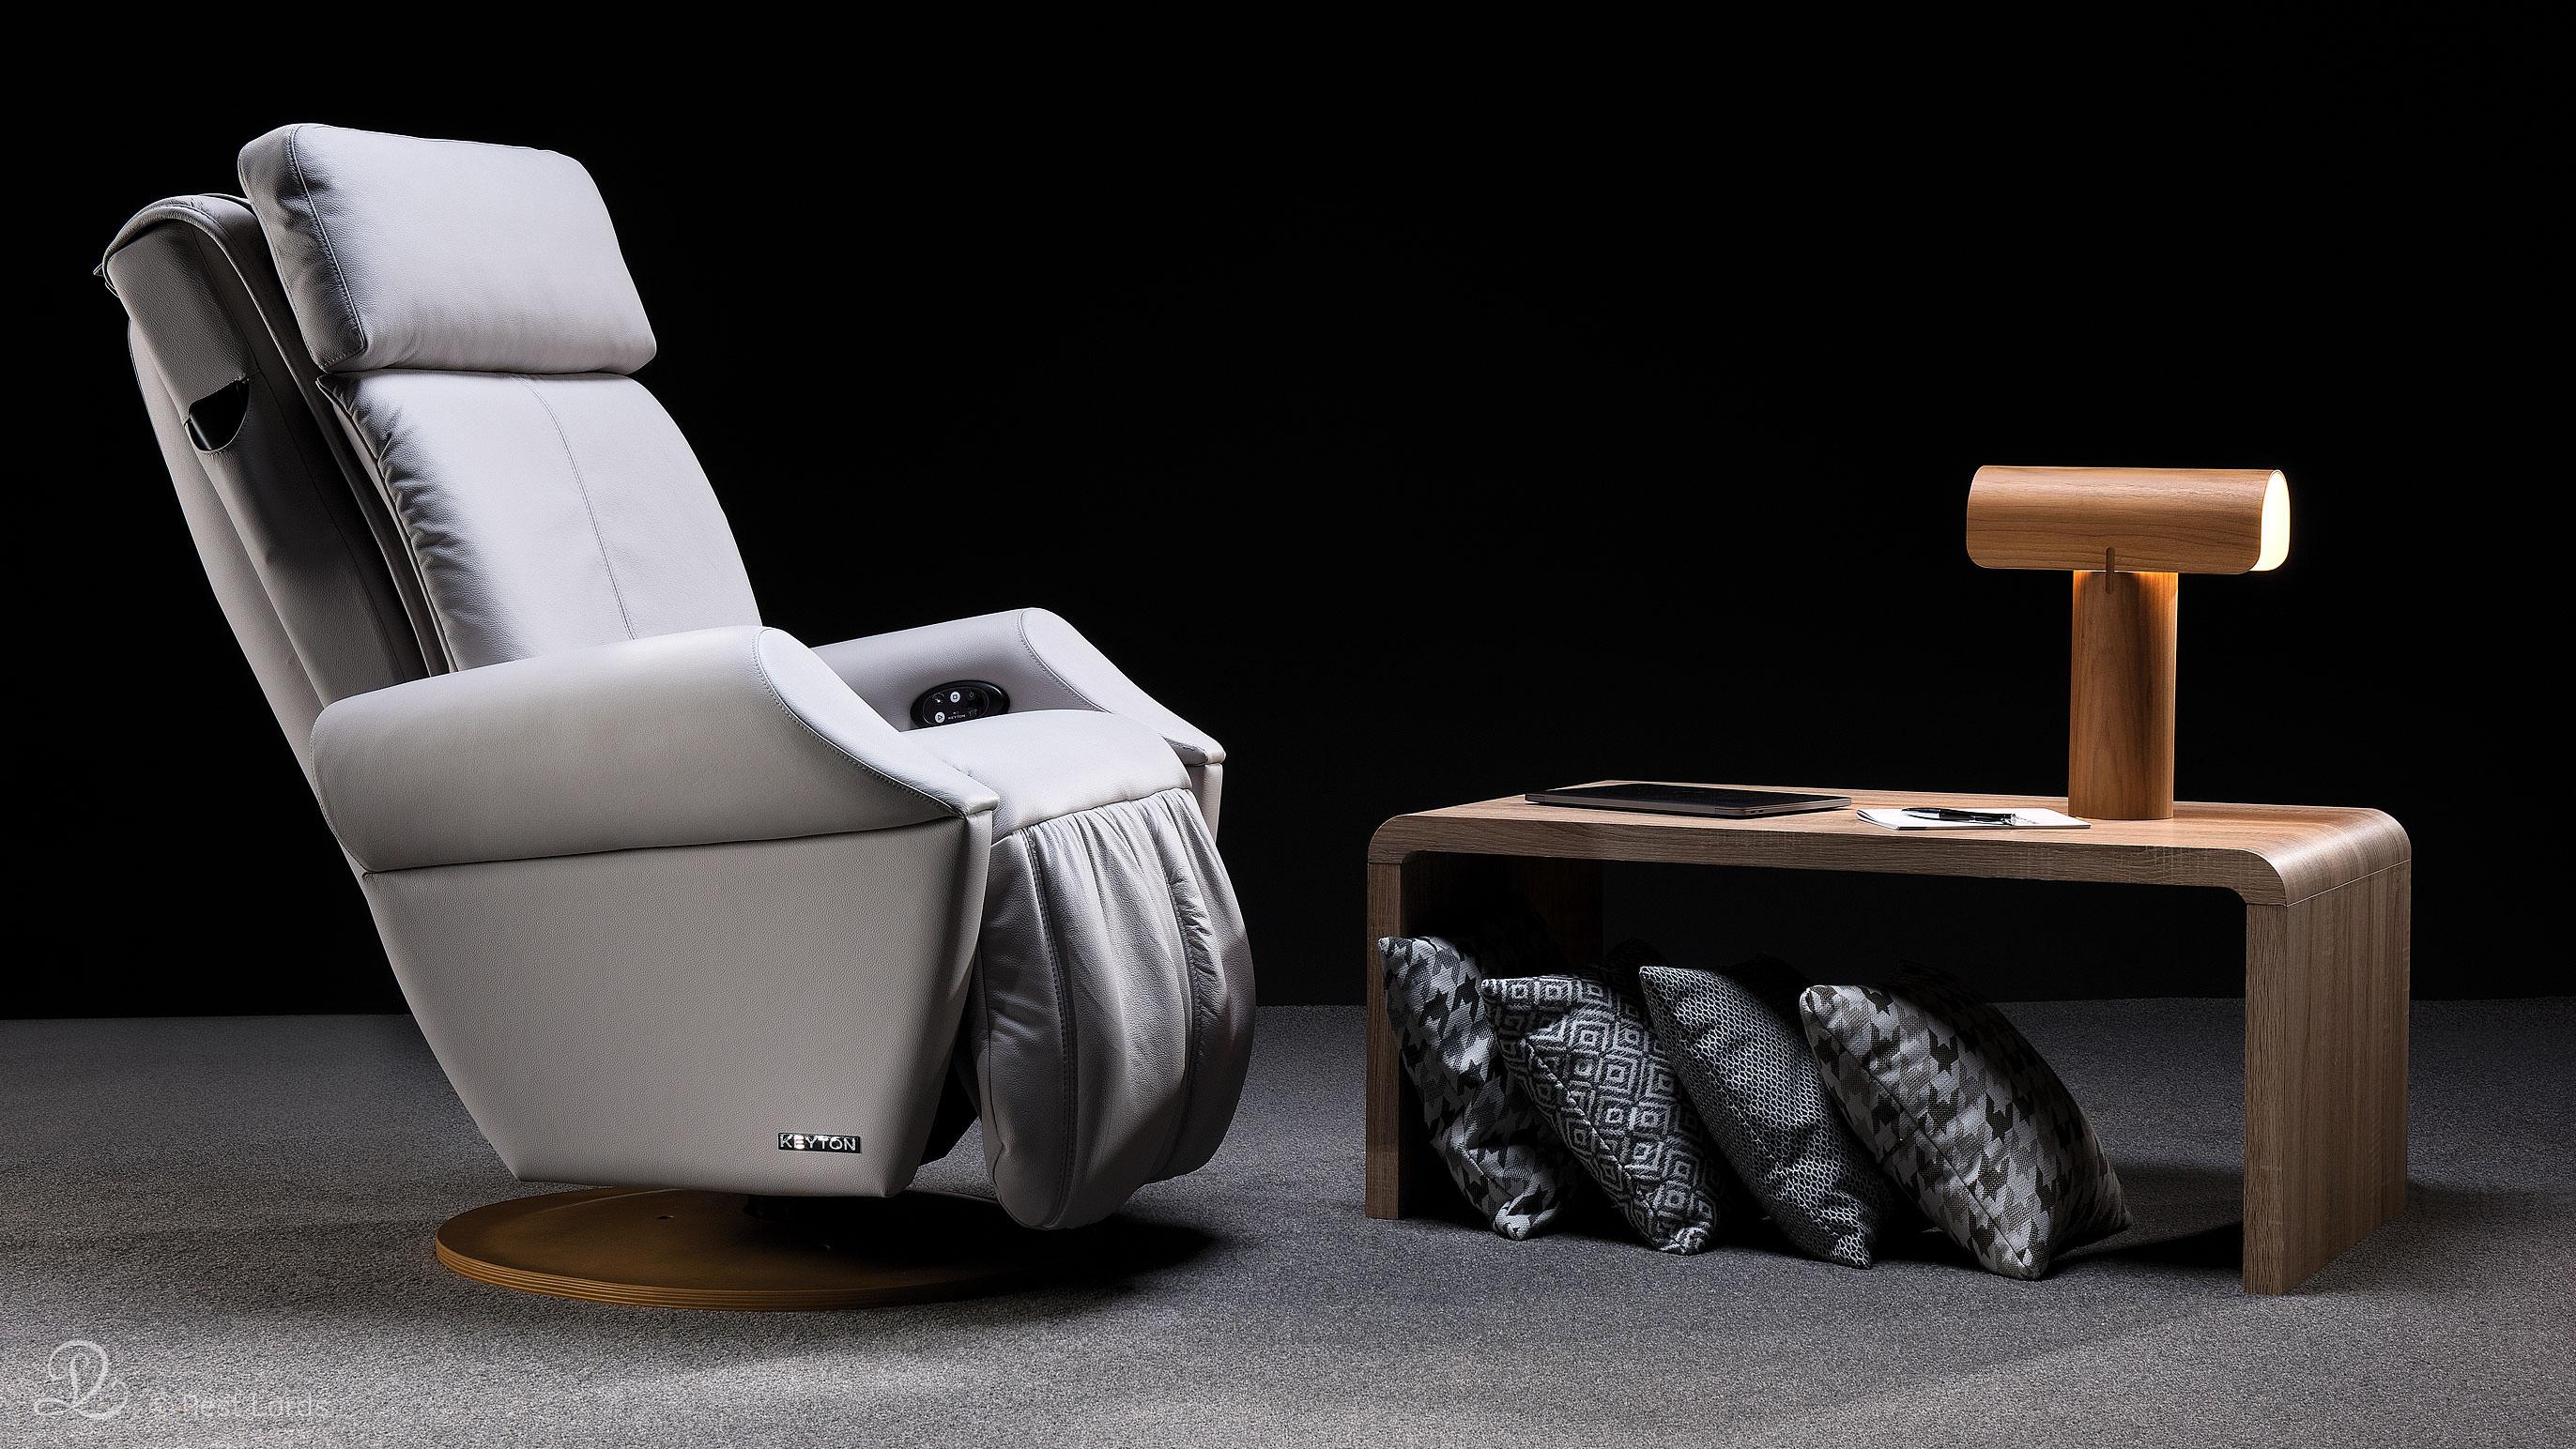 Fotel masujący Keyton H10 Royal aranżacja